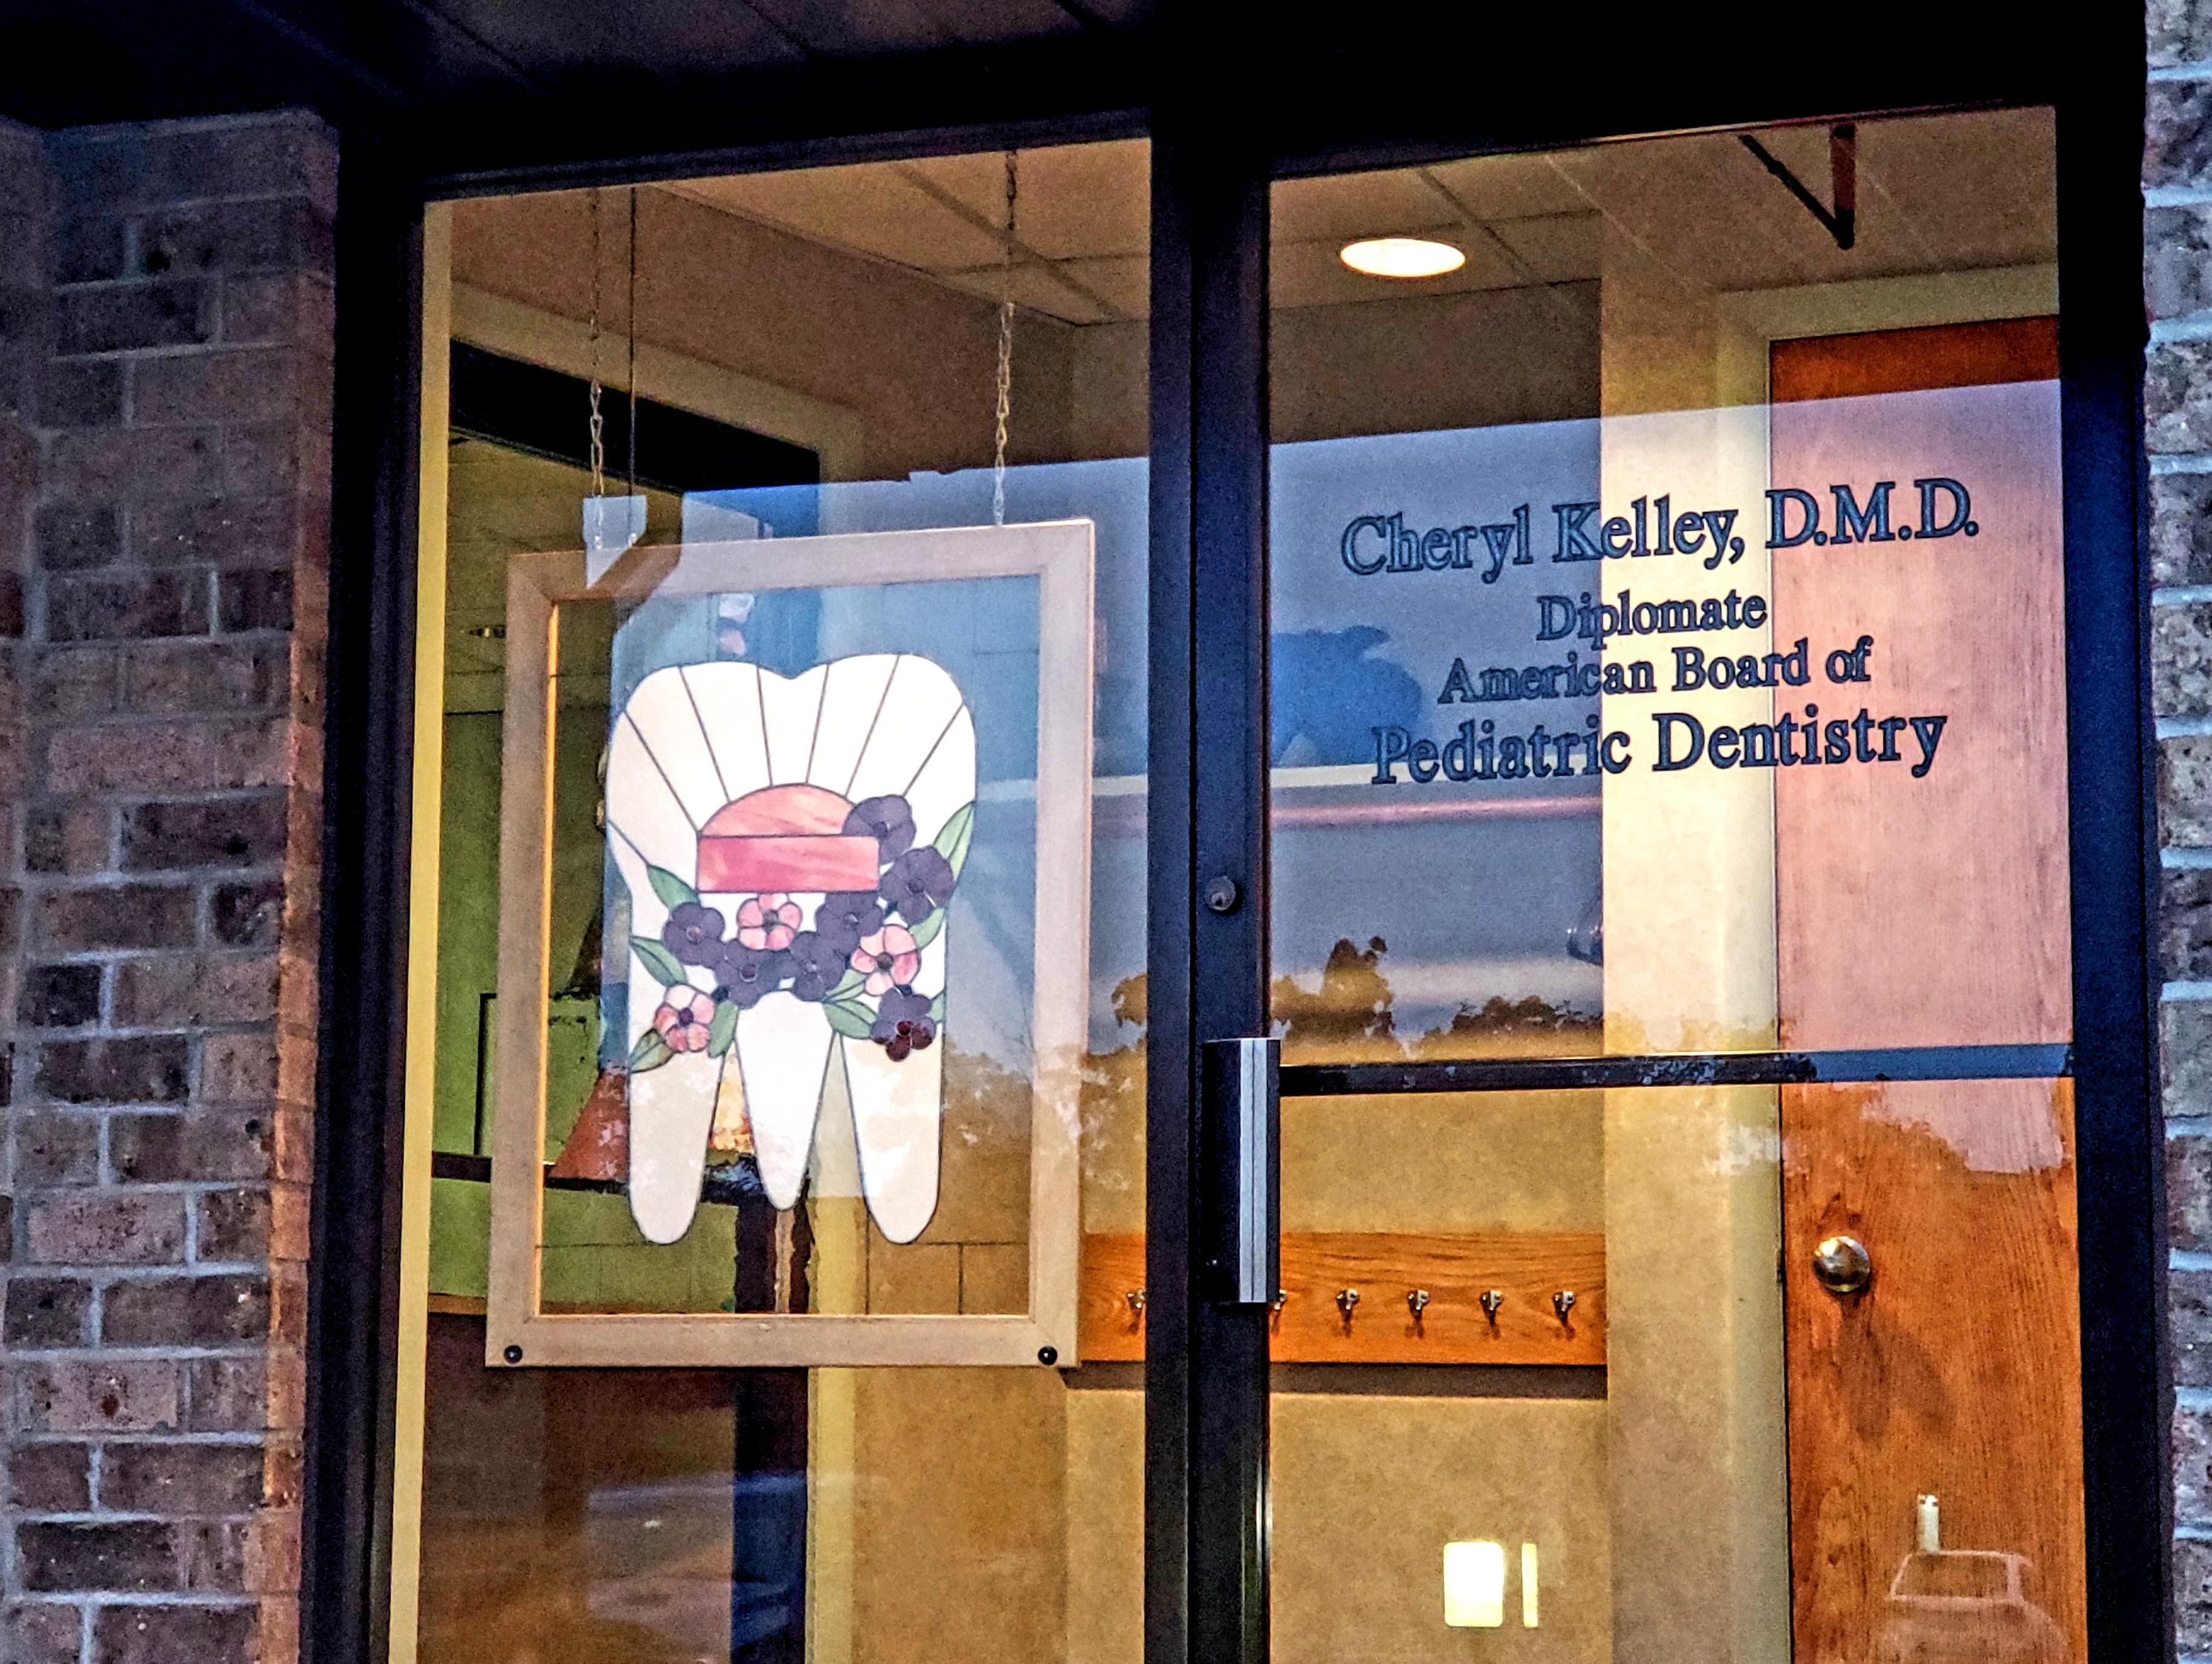 Cheryl Kelley DMD reviews | Dentists at 370 White Spruce Blvd. - Rochester NY